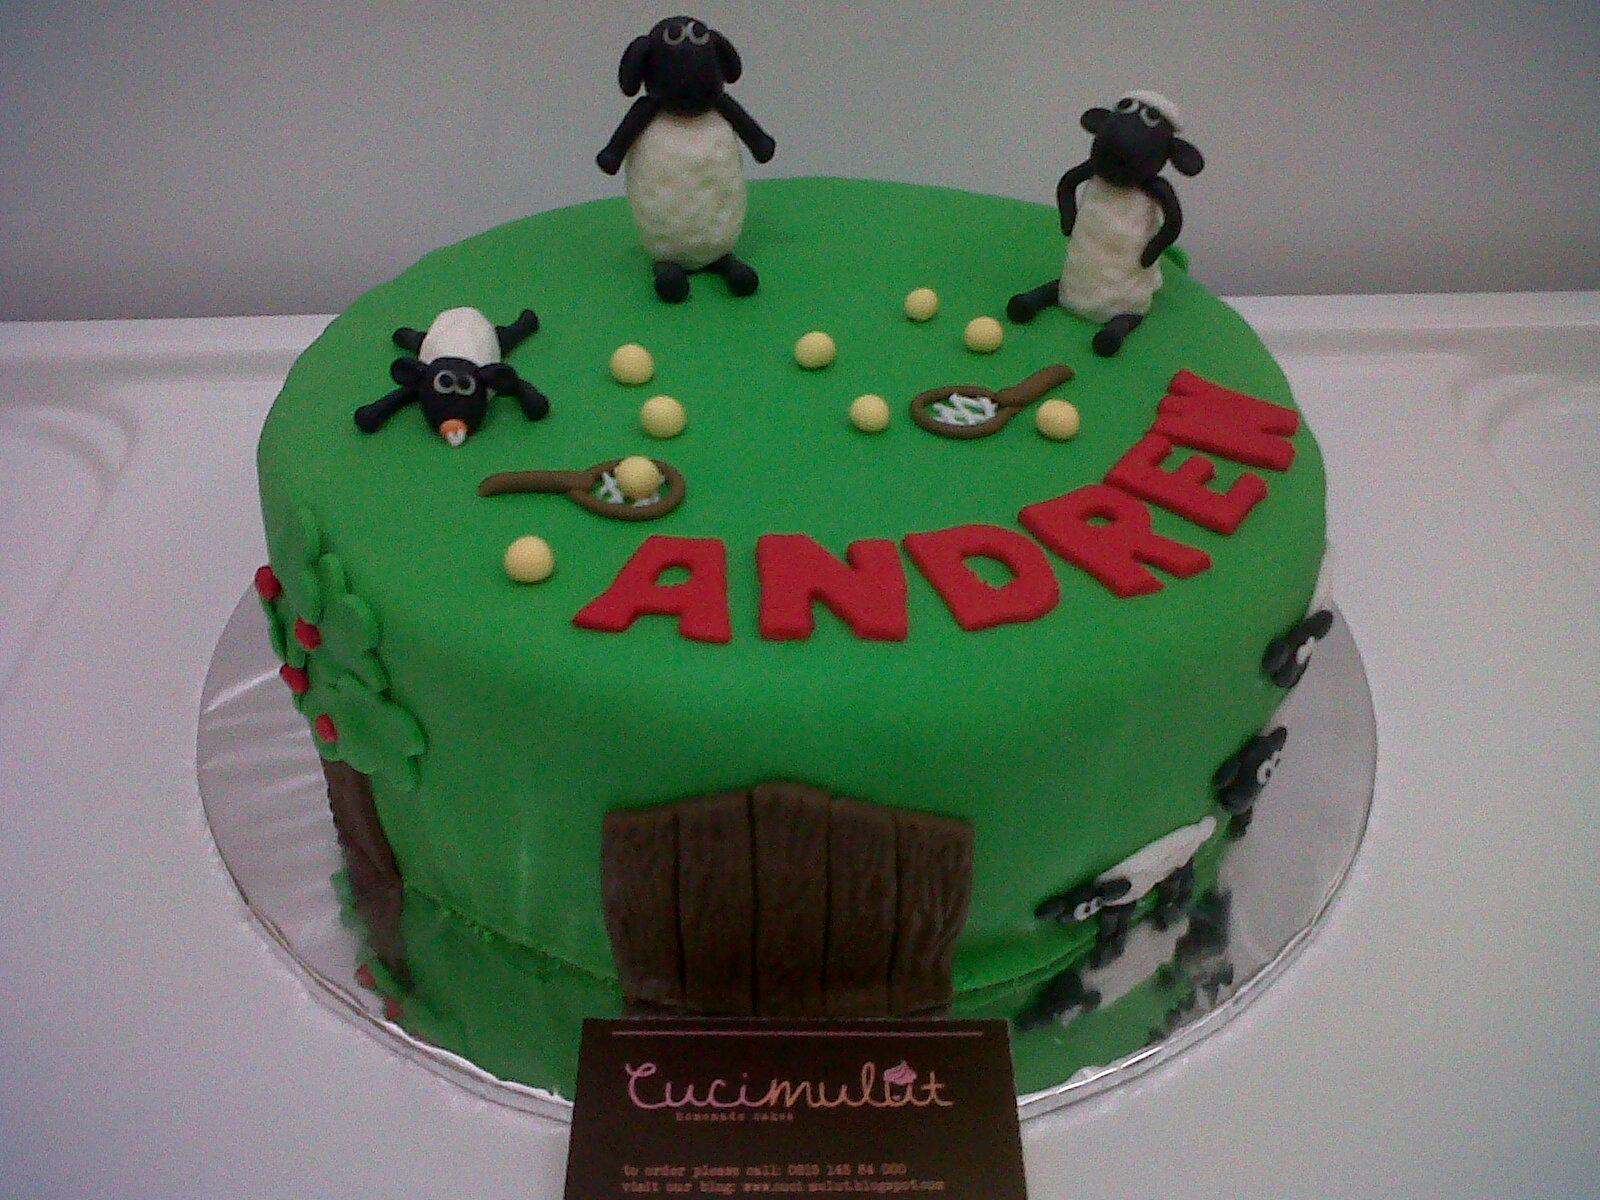 Happy Birthday Darryl Cake Ideas And Designs